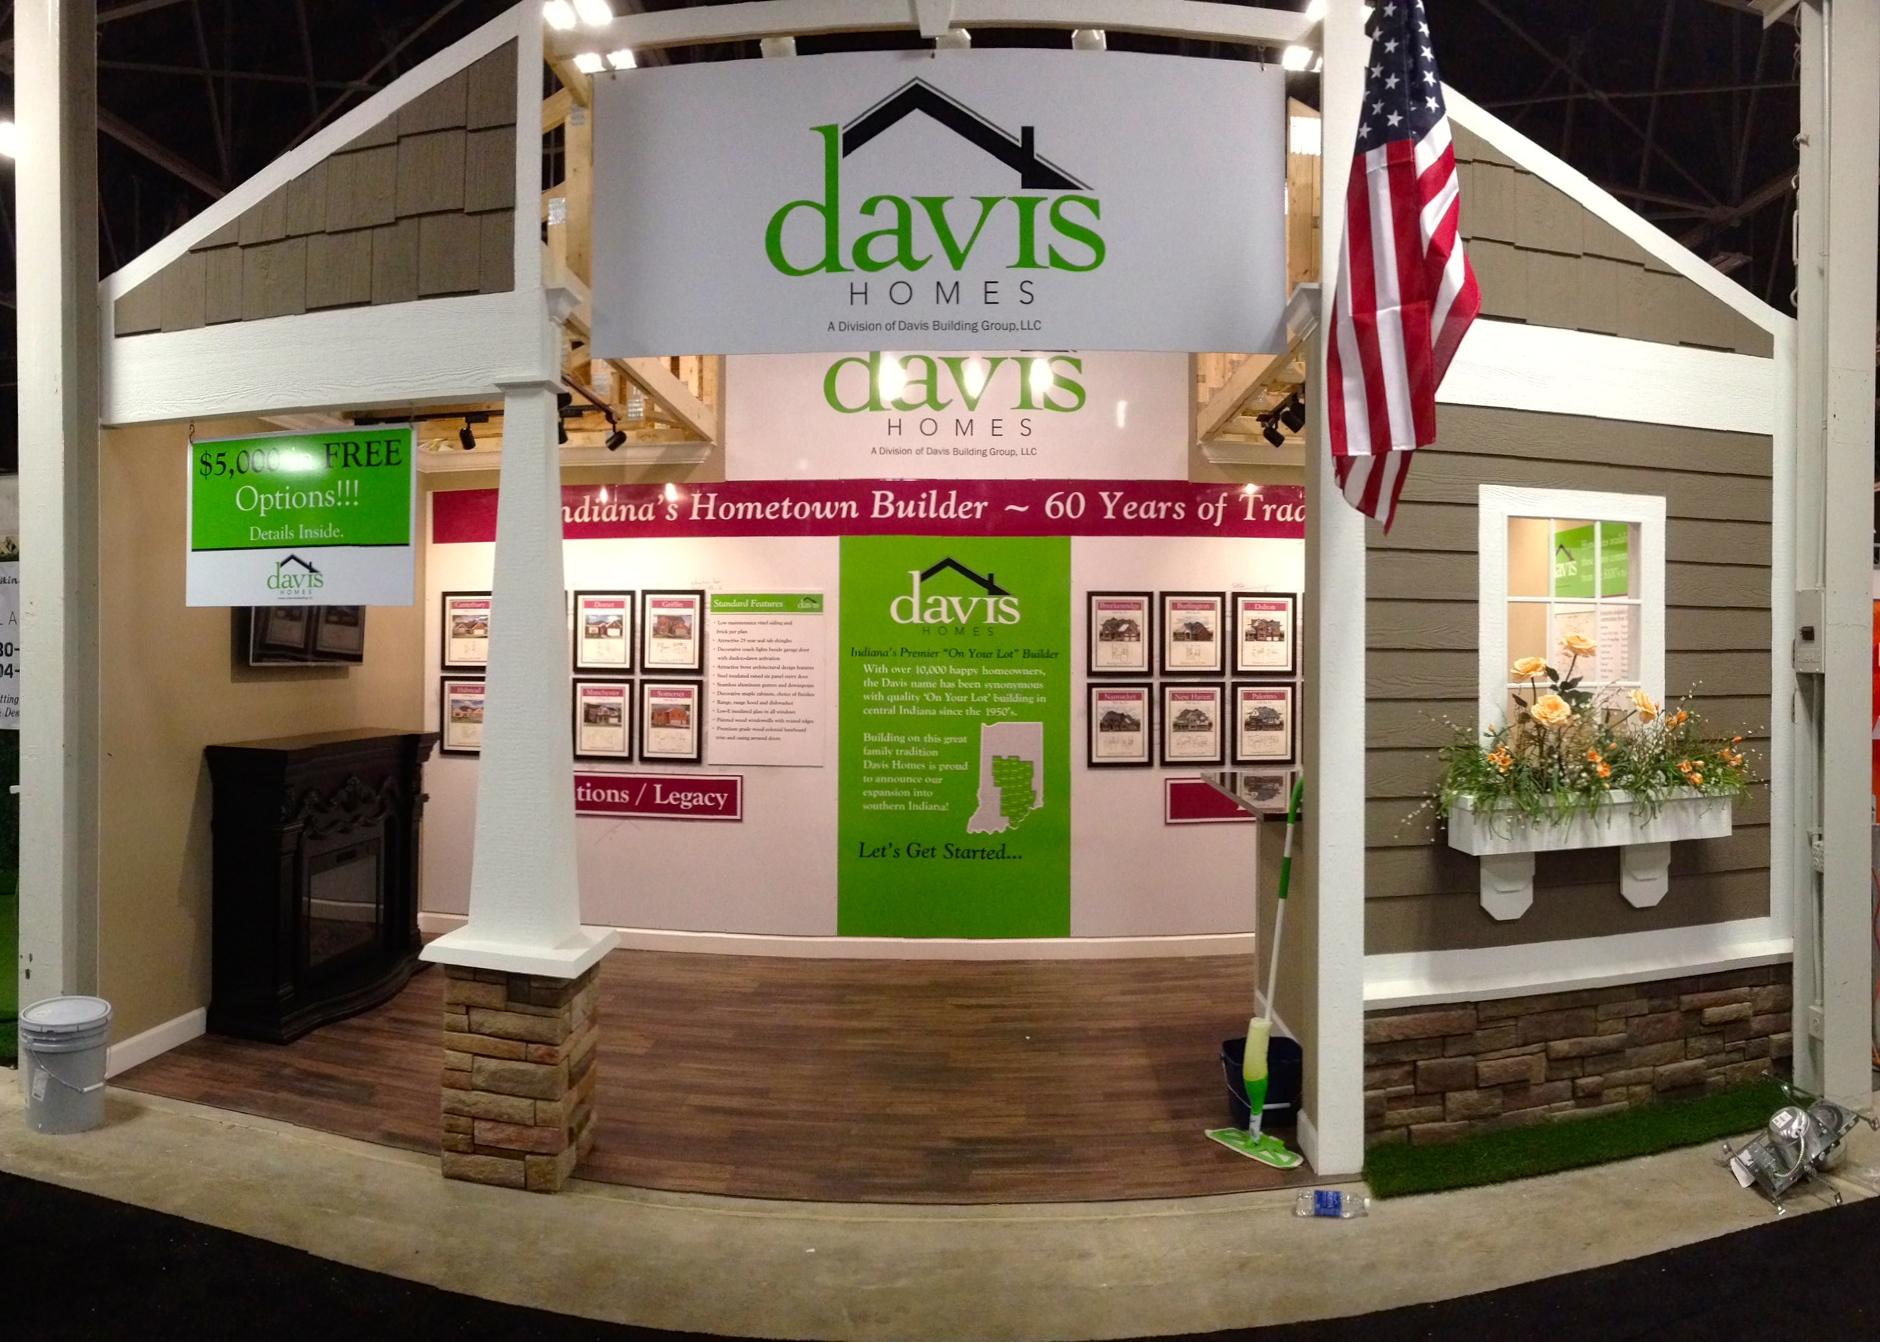 Davis Homes - 2015 Indianapolis Home Show Model Home